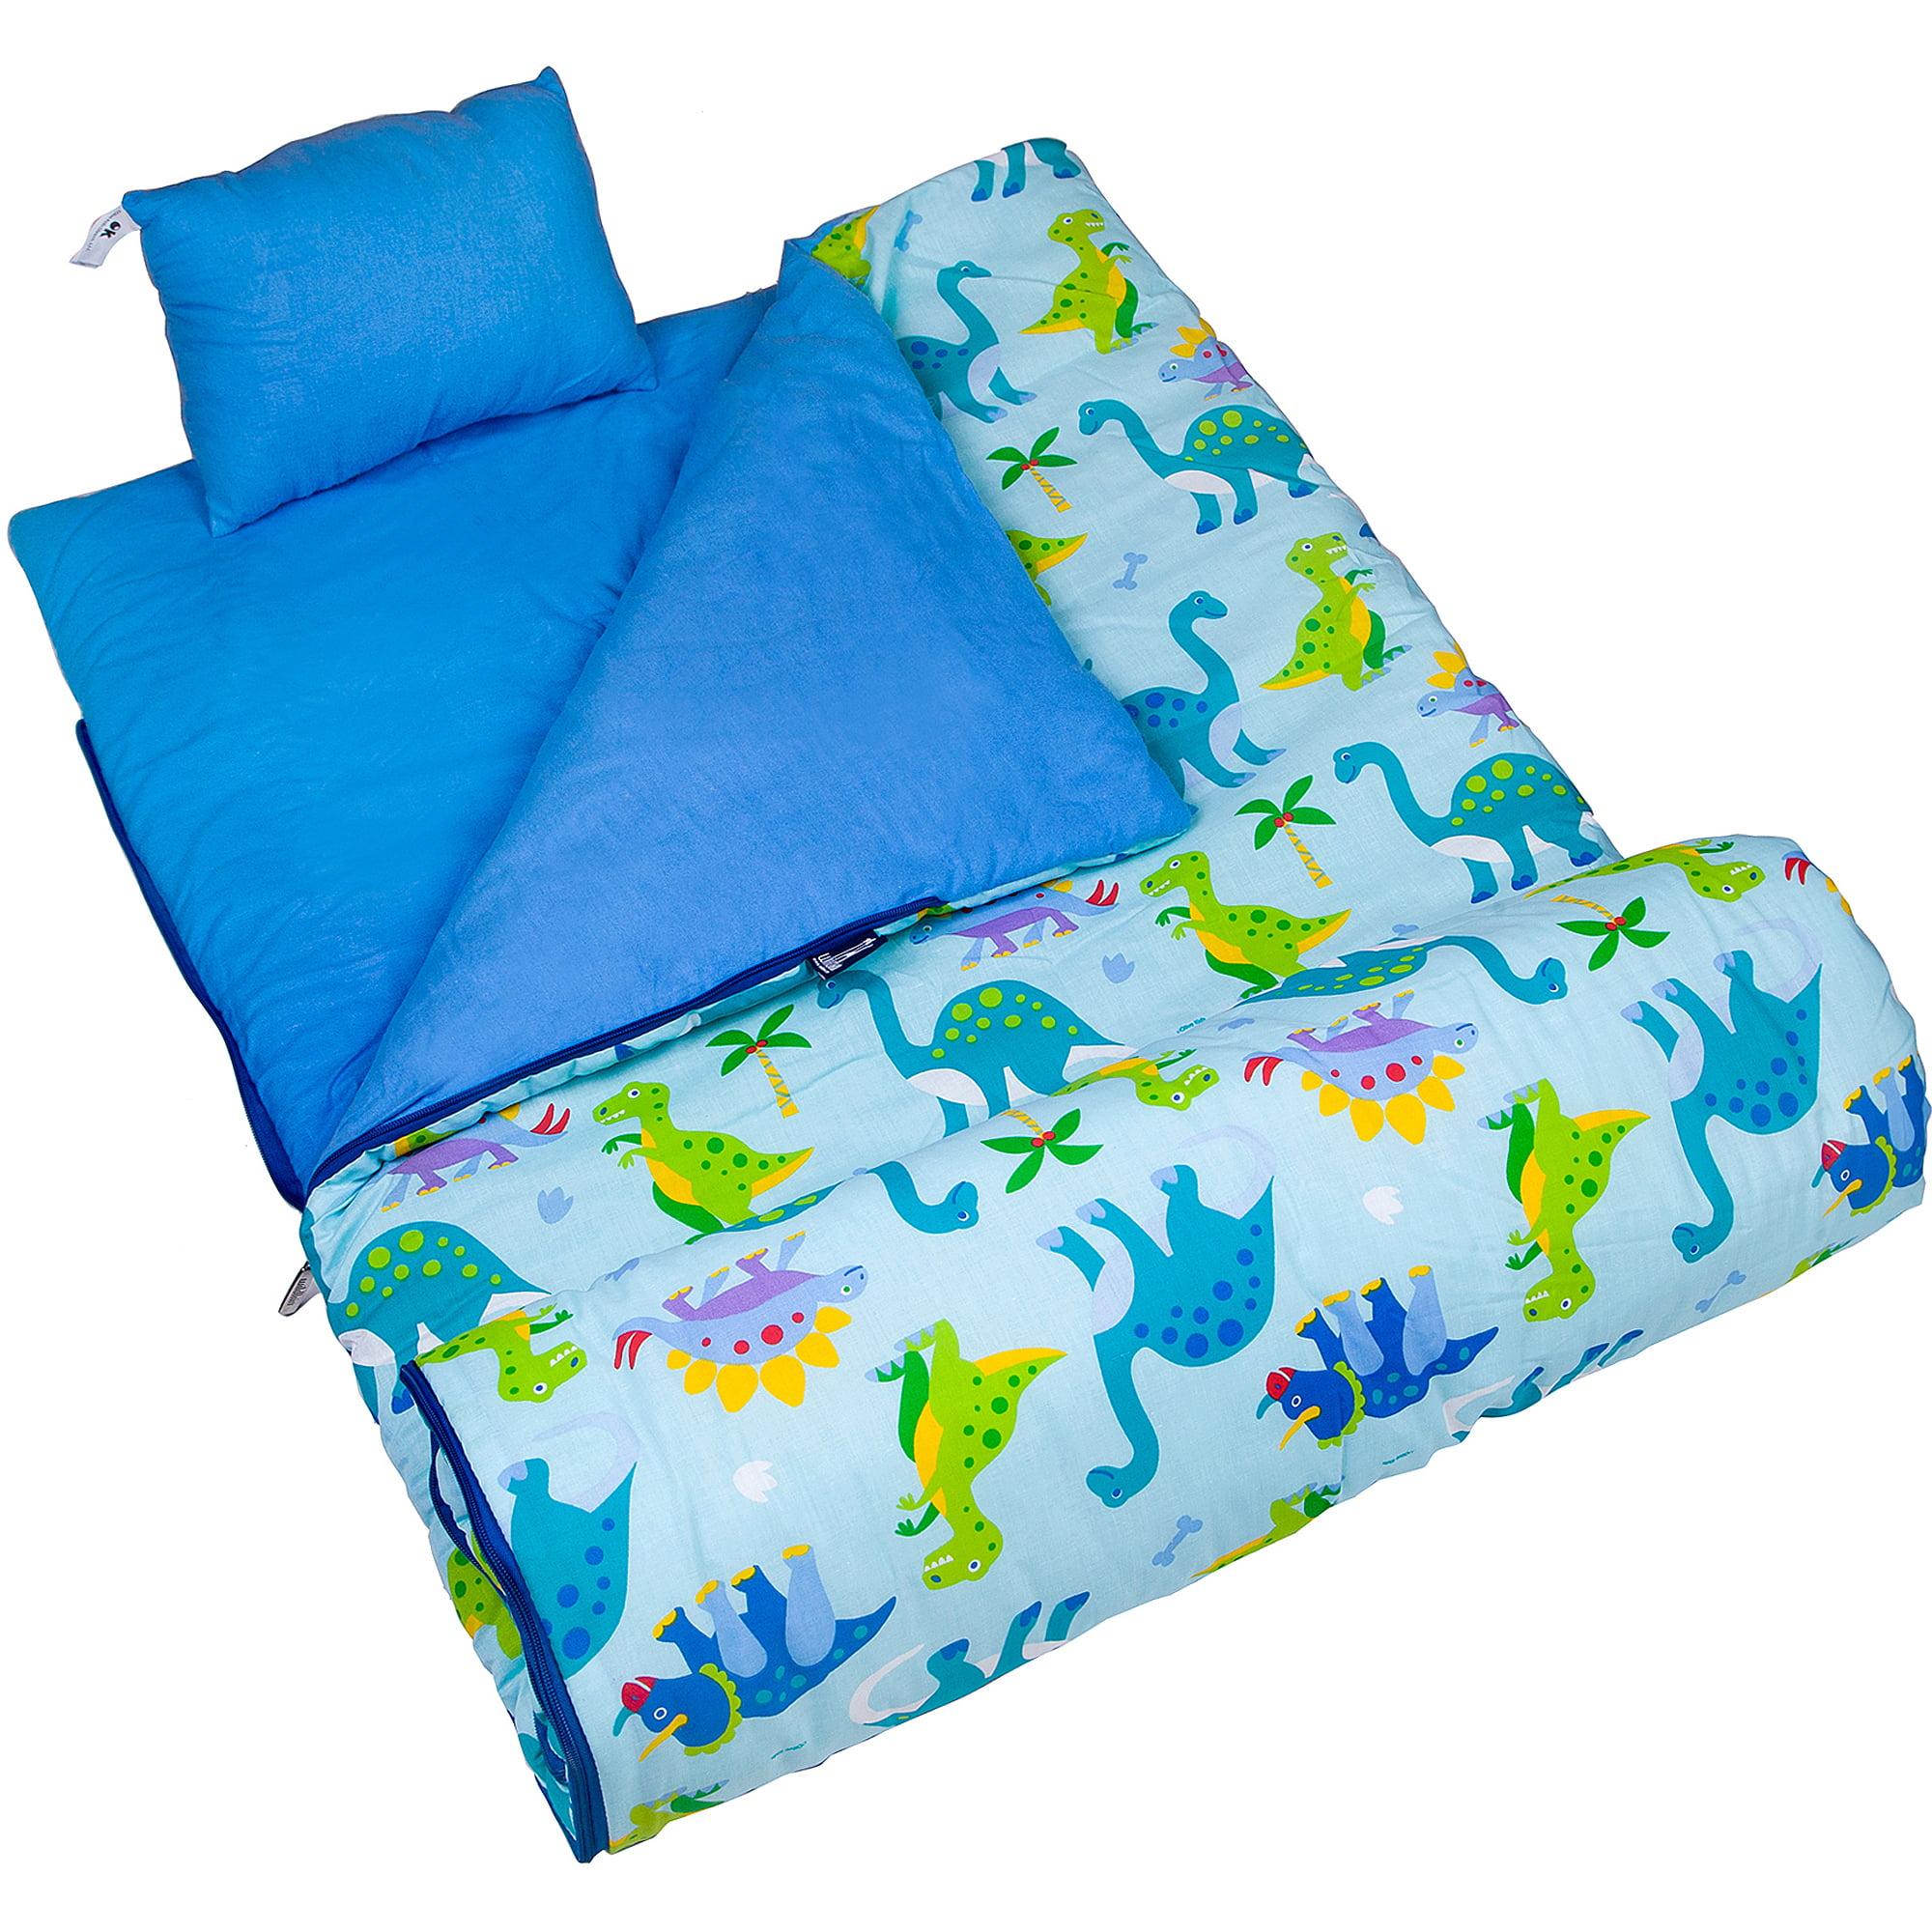 Olive Kids' Dinosaur Land Original Sleeping Bag